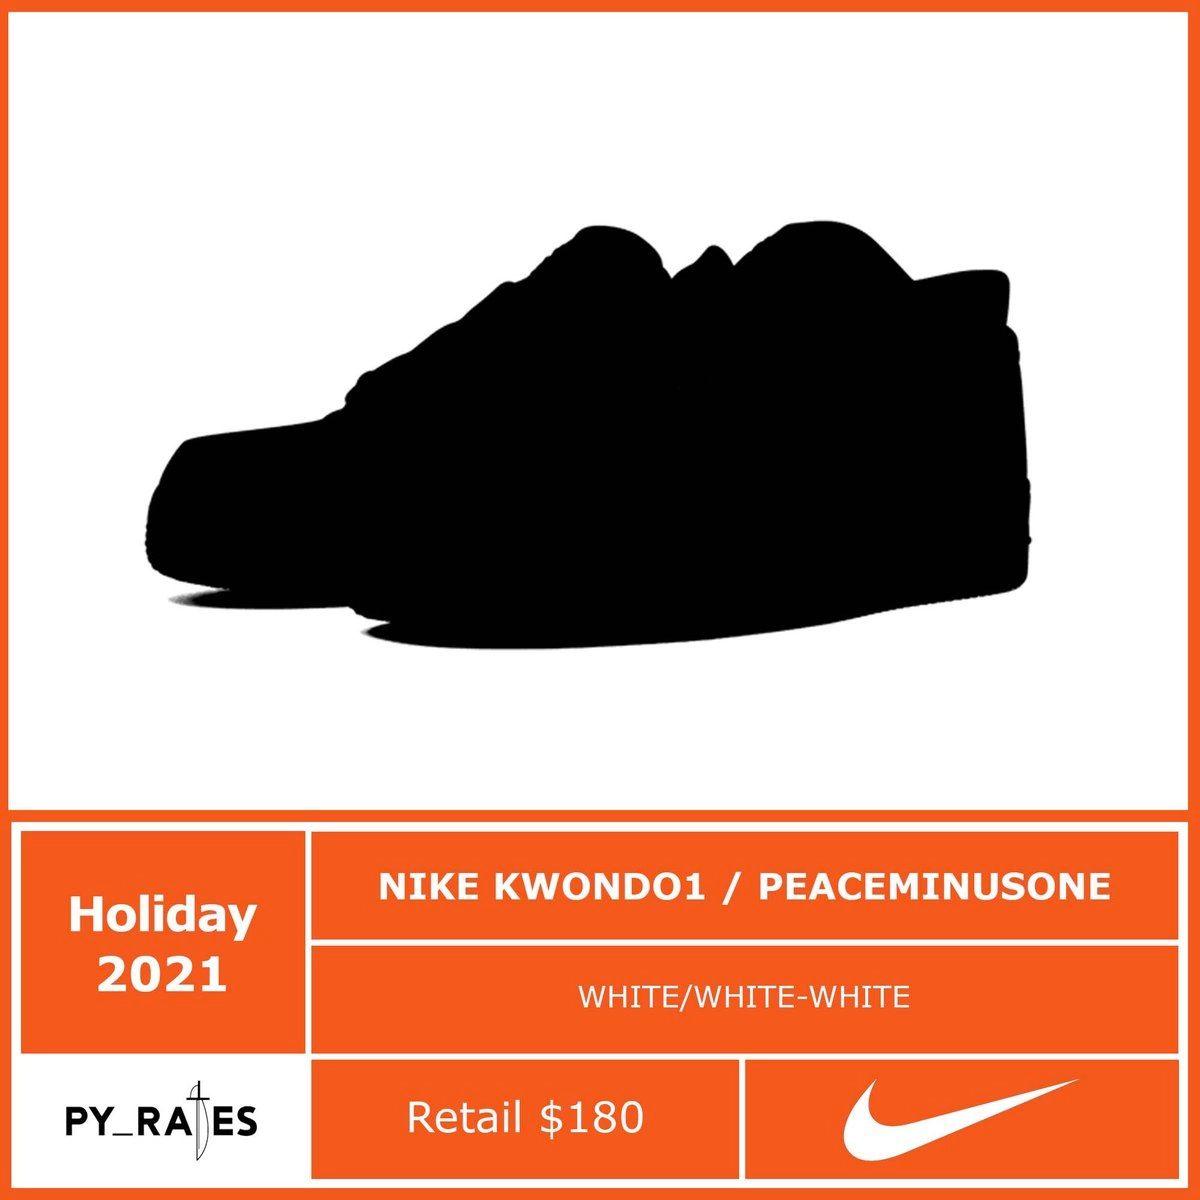 Peaceminusone Nike Kwondo 1 Release Date Info